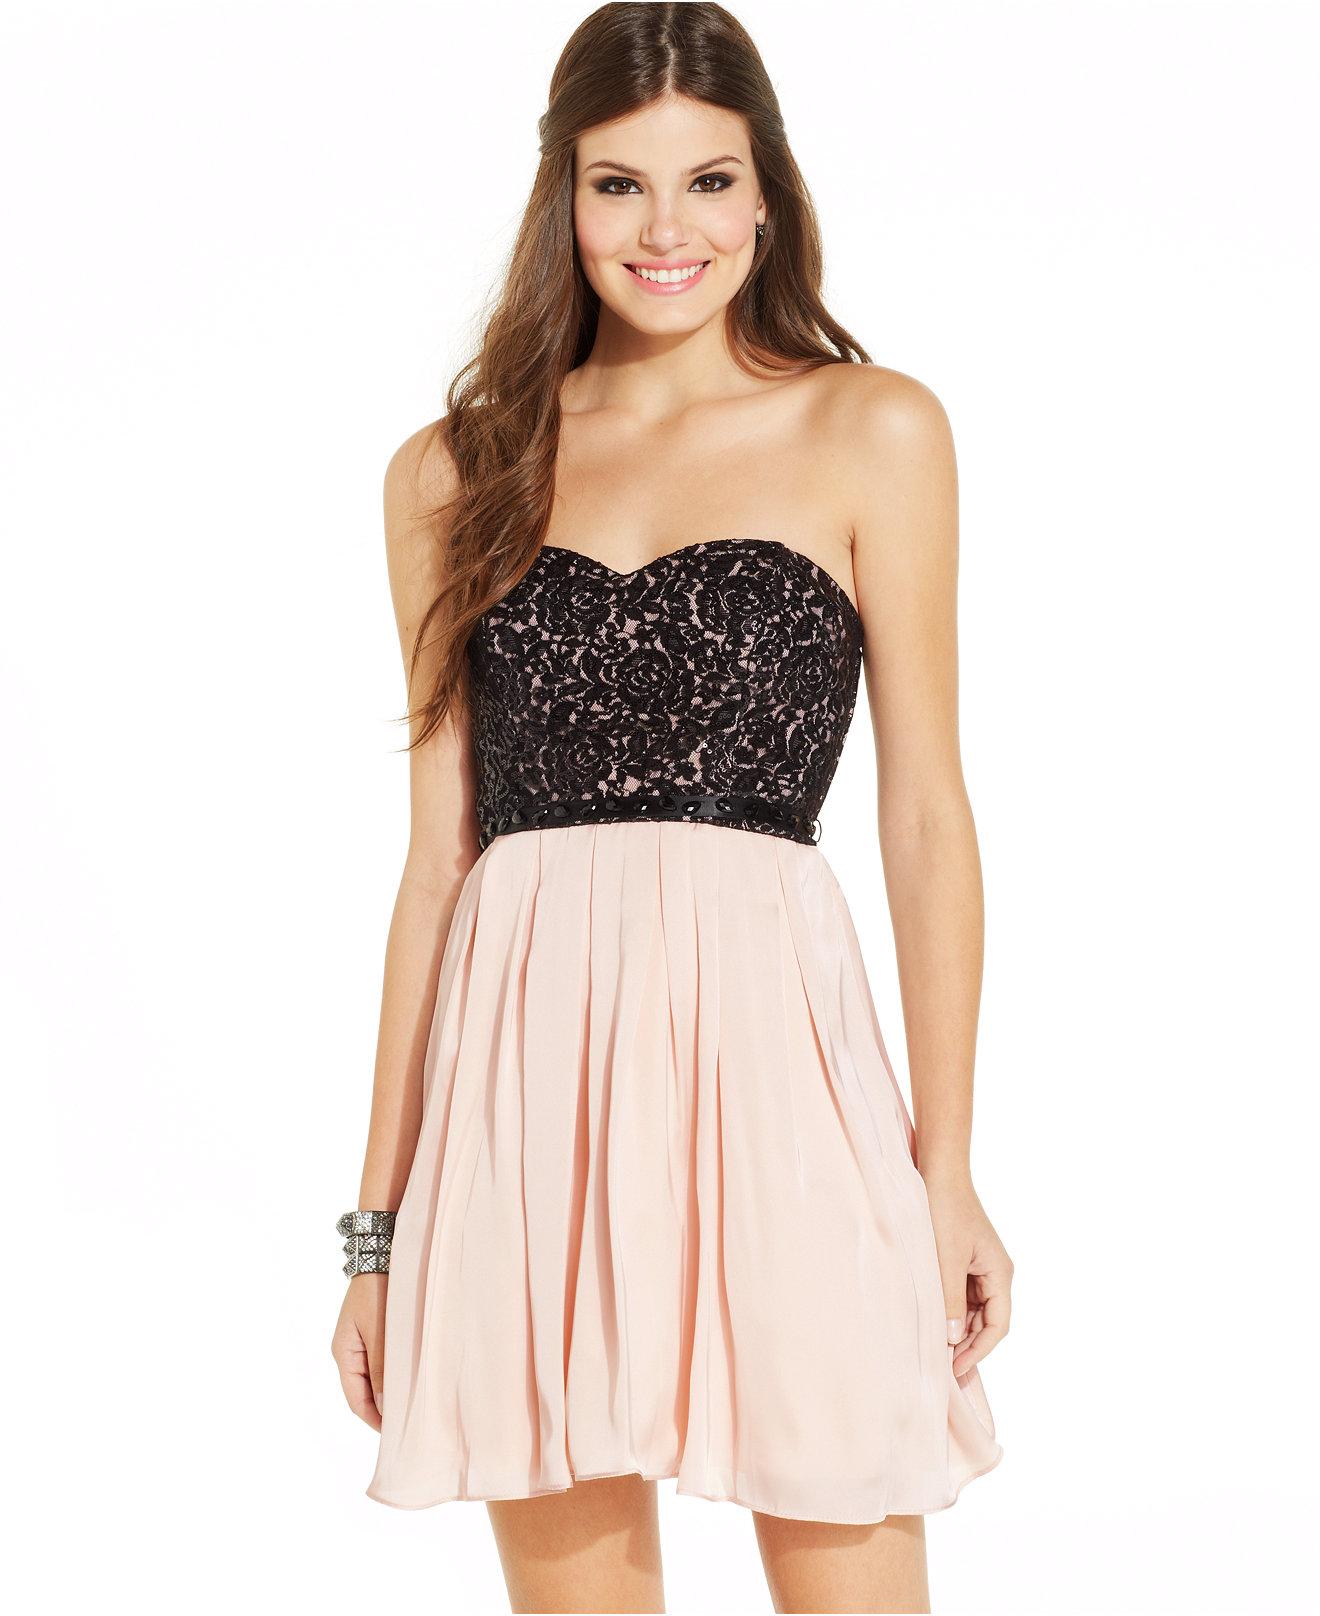 Sequin Heart Dresses